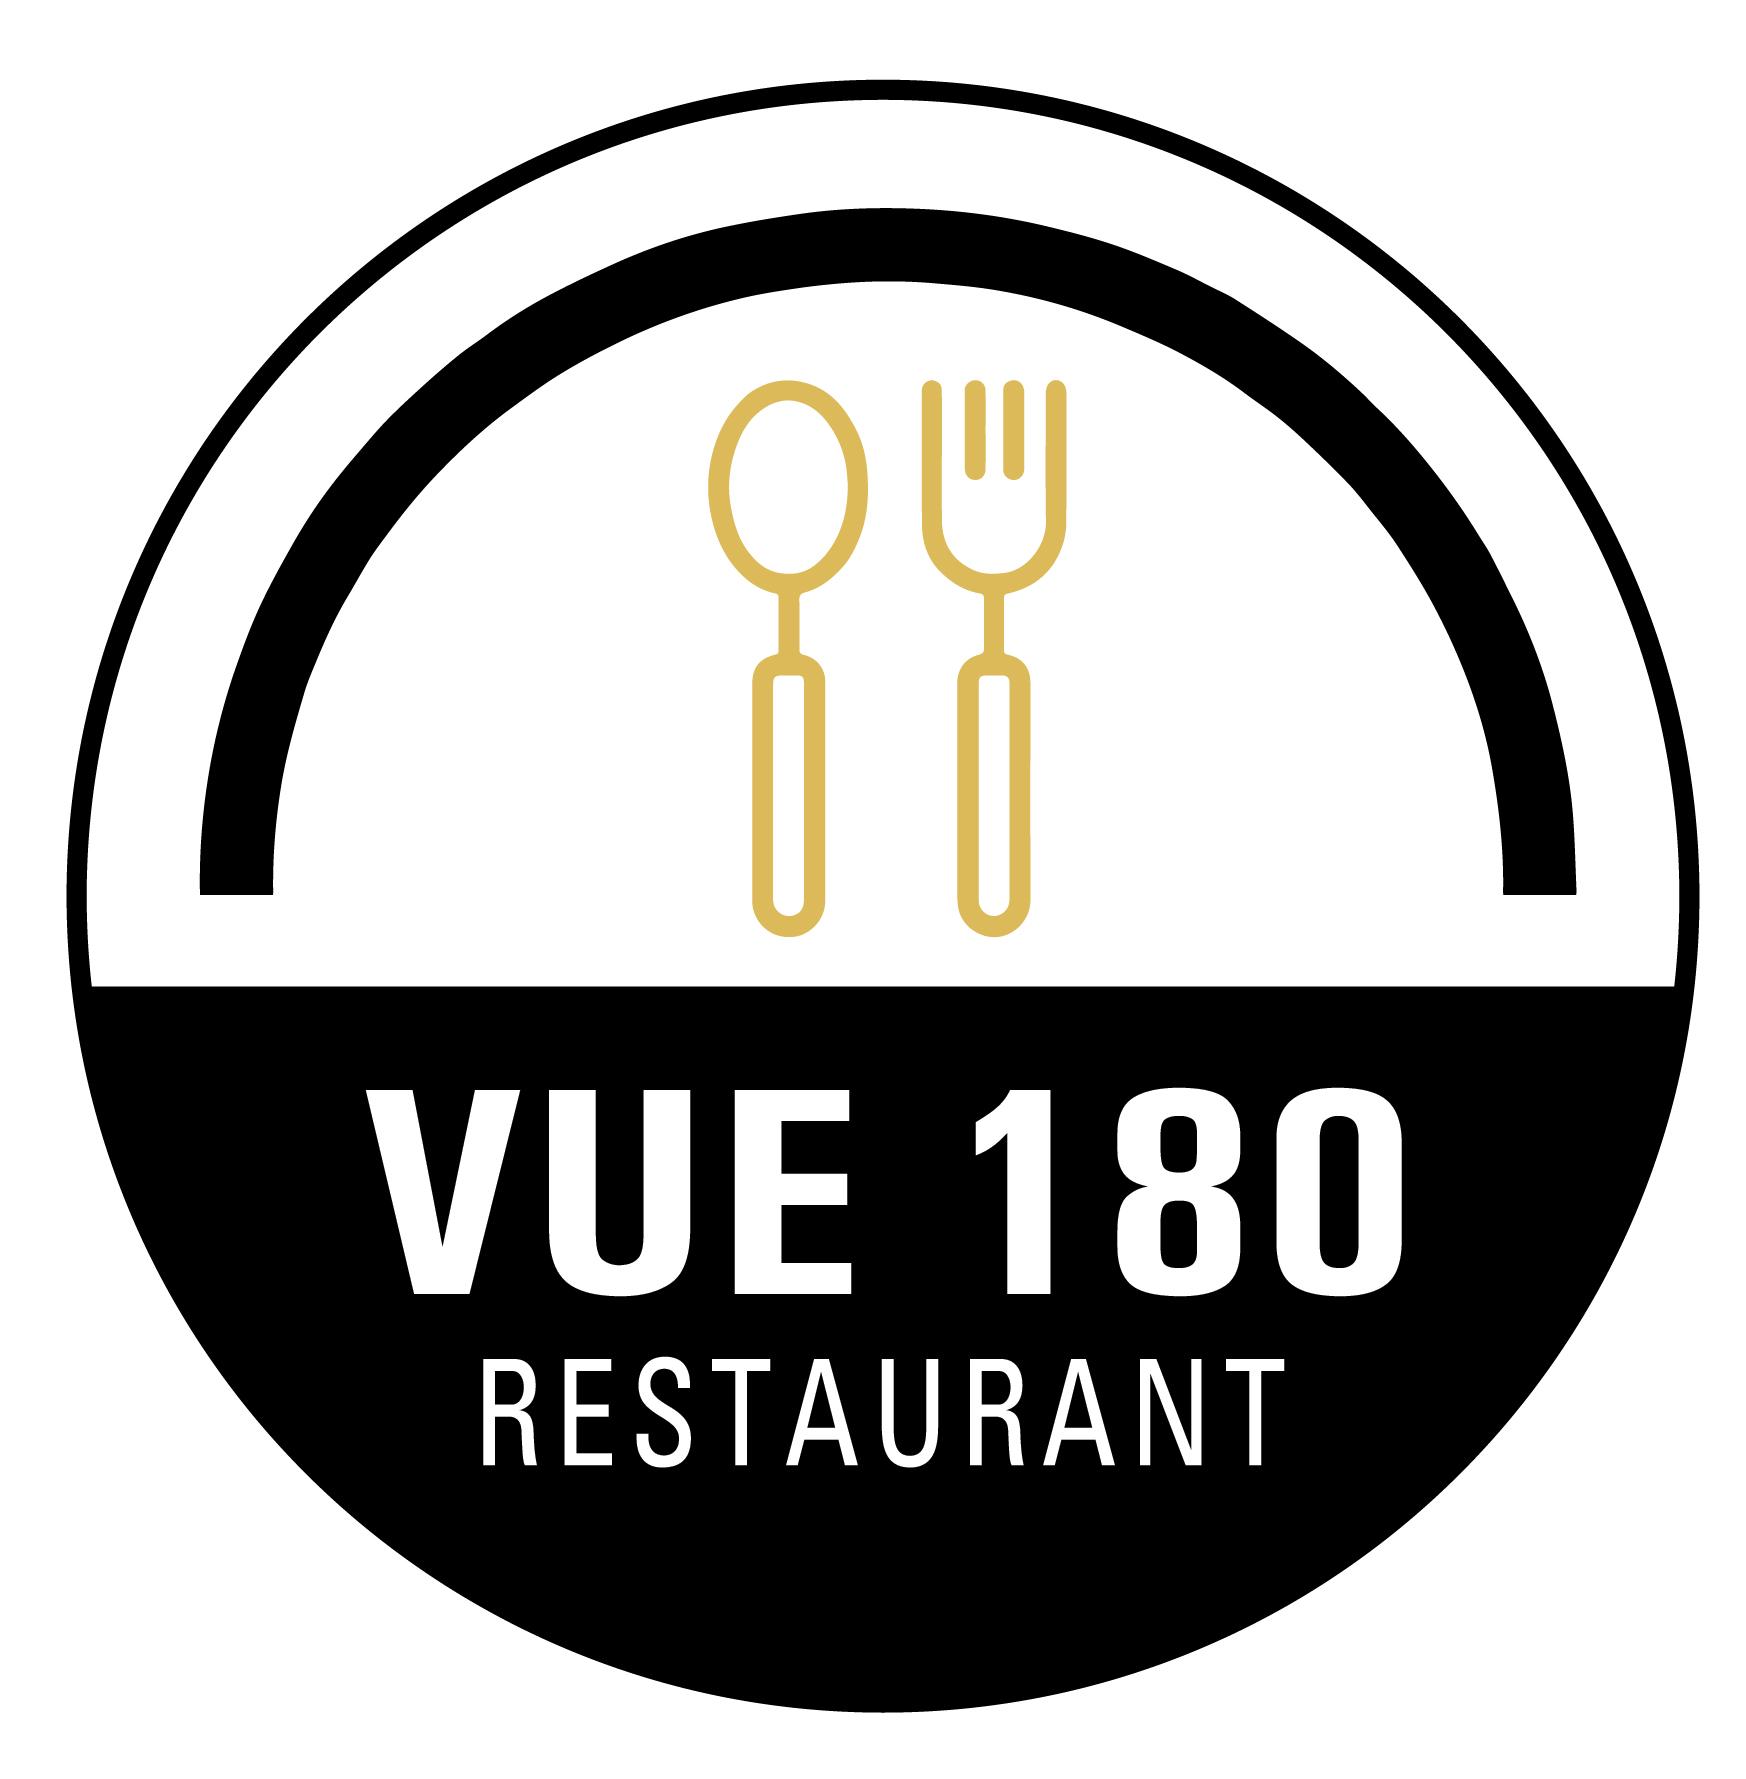 Vue 180 Restaurant